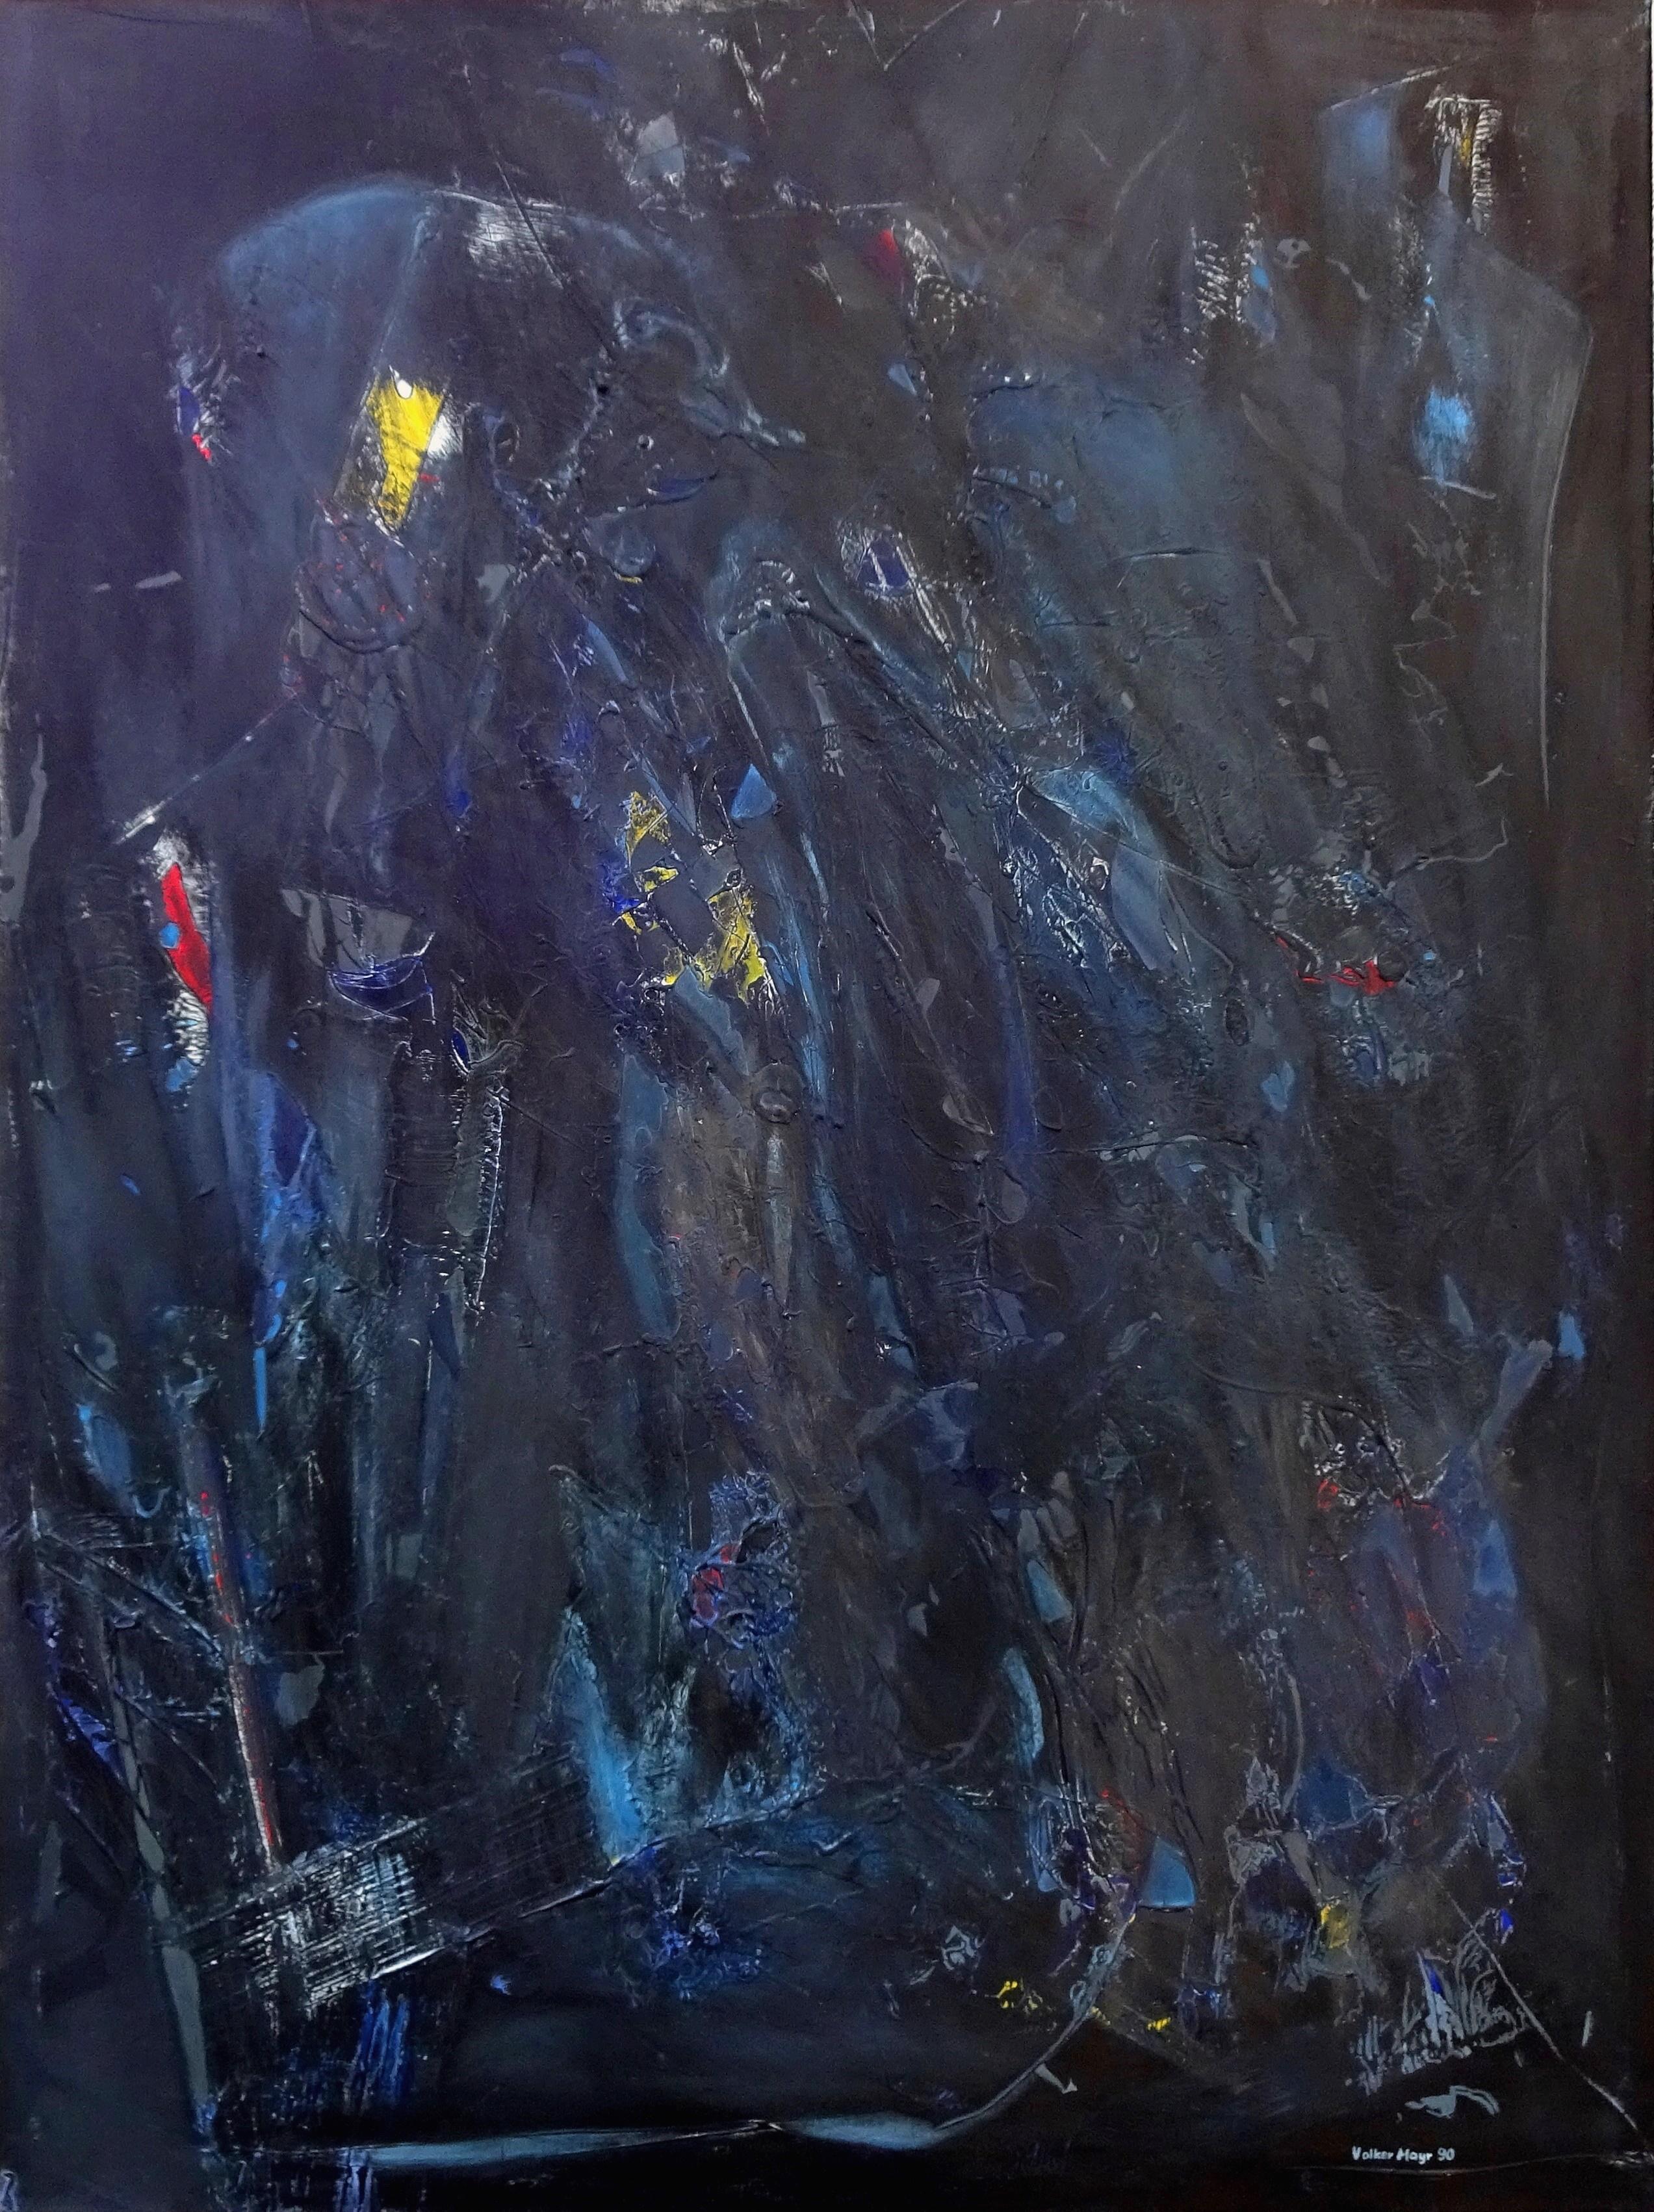 Black Beauty artwork by Volker Mayr - art listed for sale on Artplode